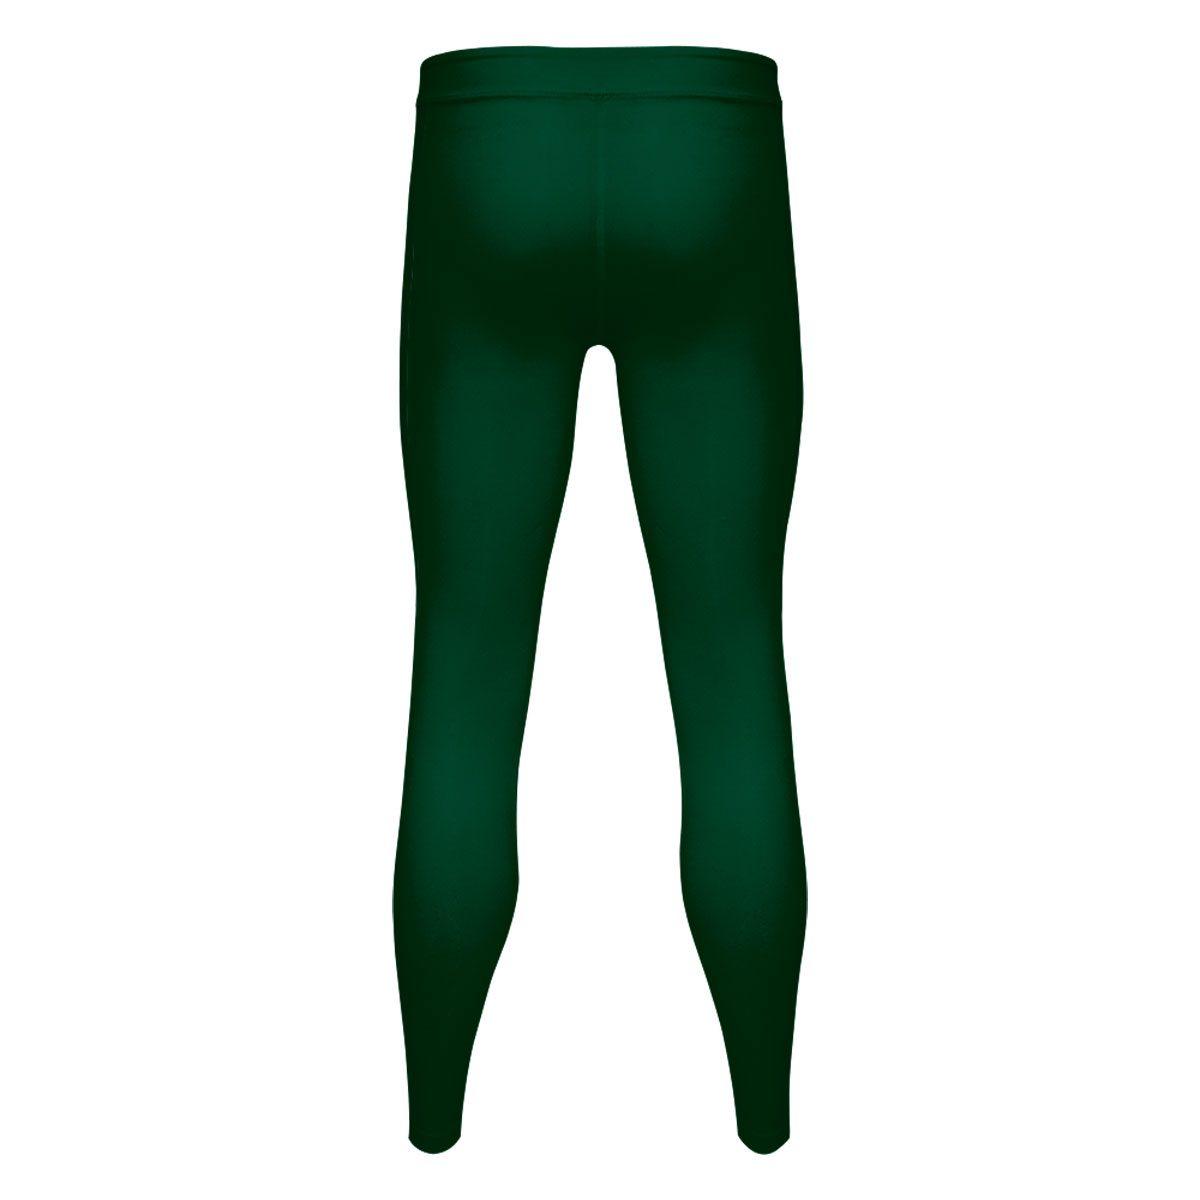 c2515e6ae1 Ladies Compression Tights - Dark Green - Blackchrome